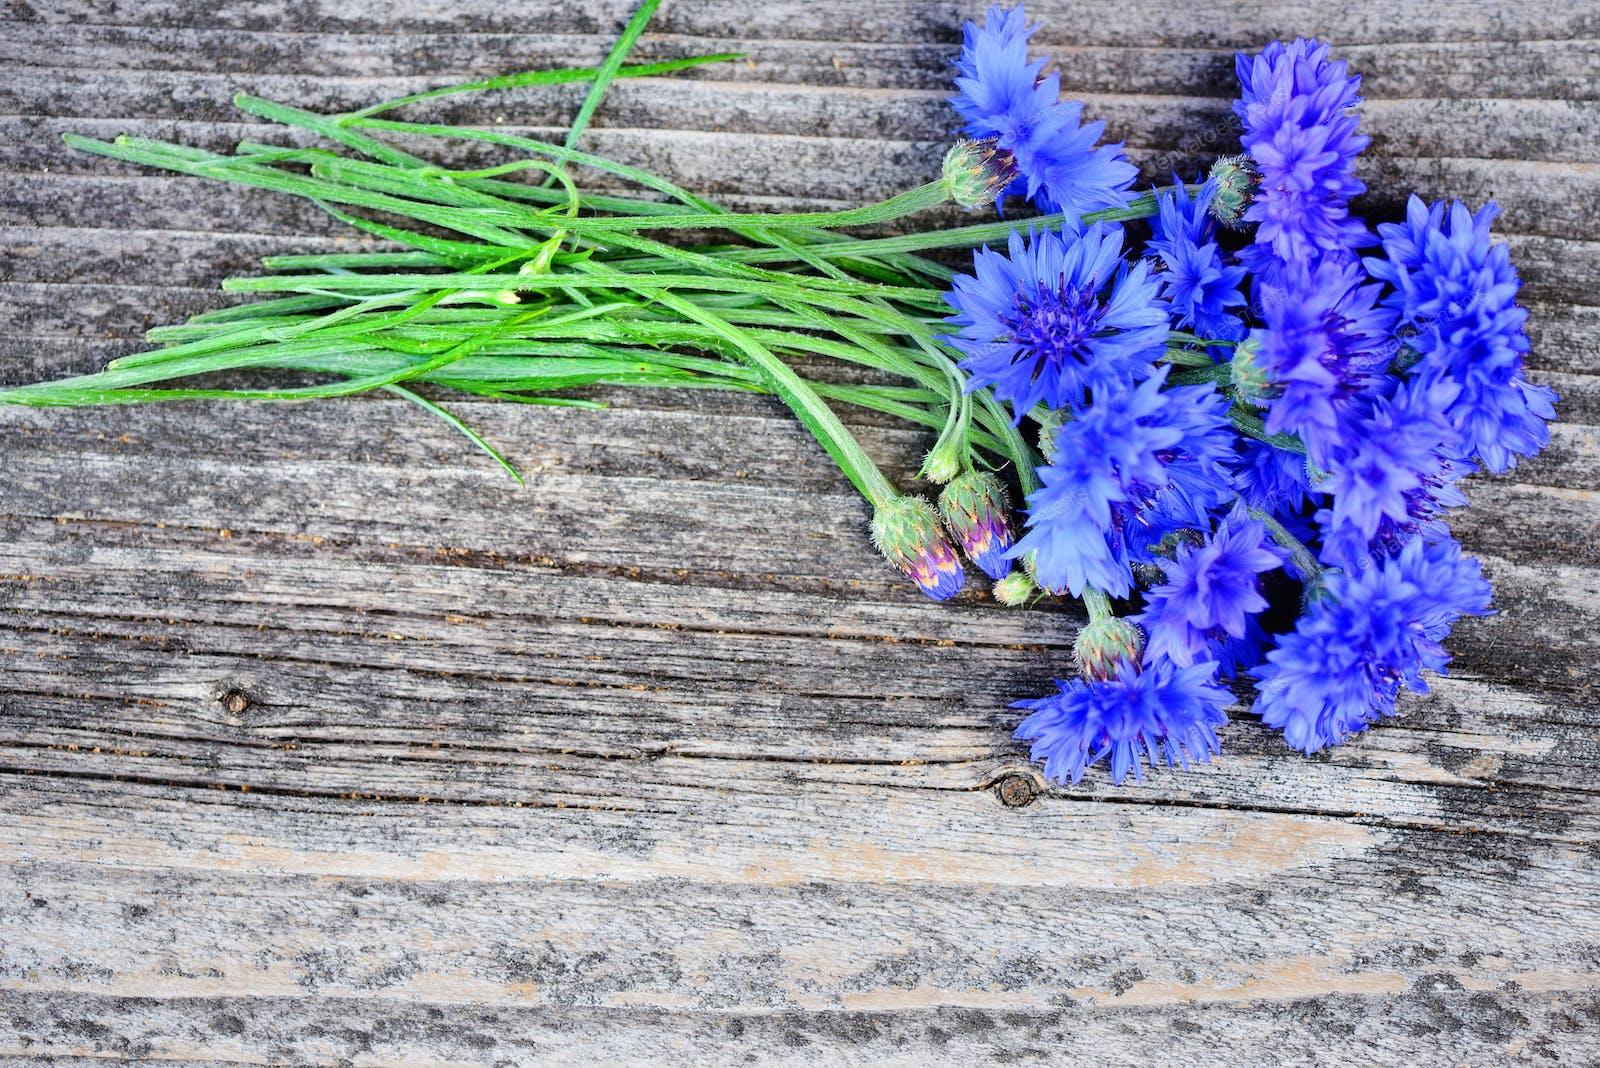 Cornflower Blue Flowers Centaurea Cyanus On An Old Wooden Tabl Photo By Nataljusja On Envato Elements